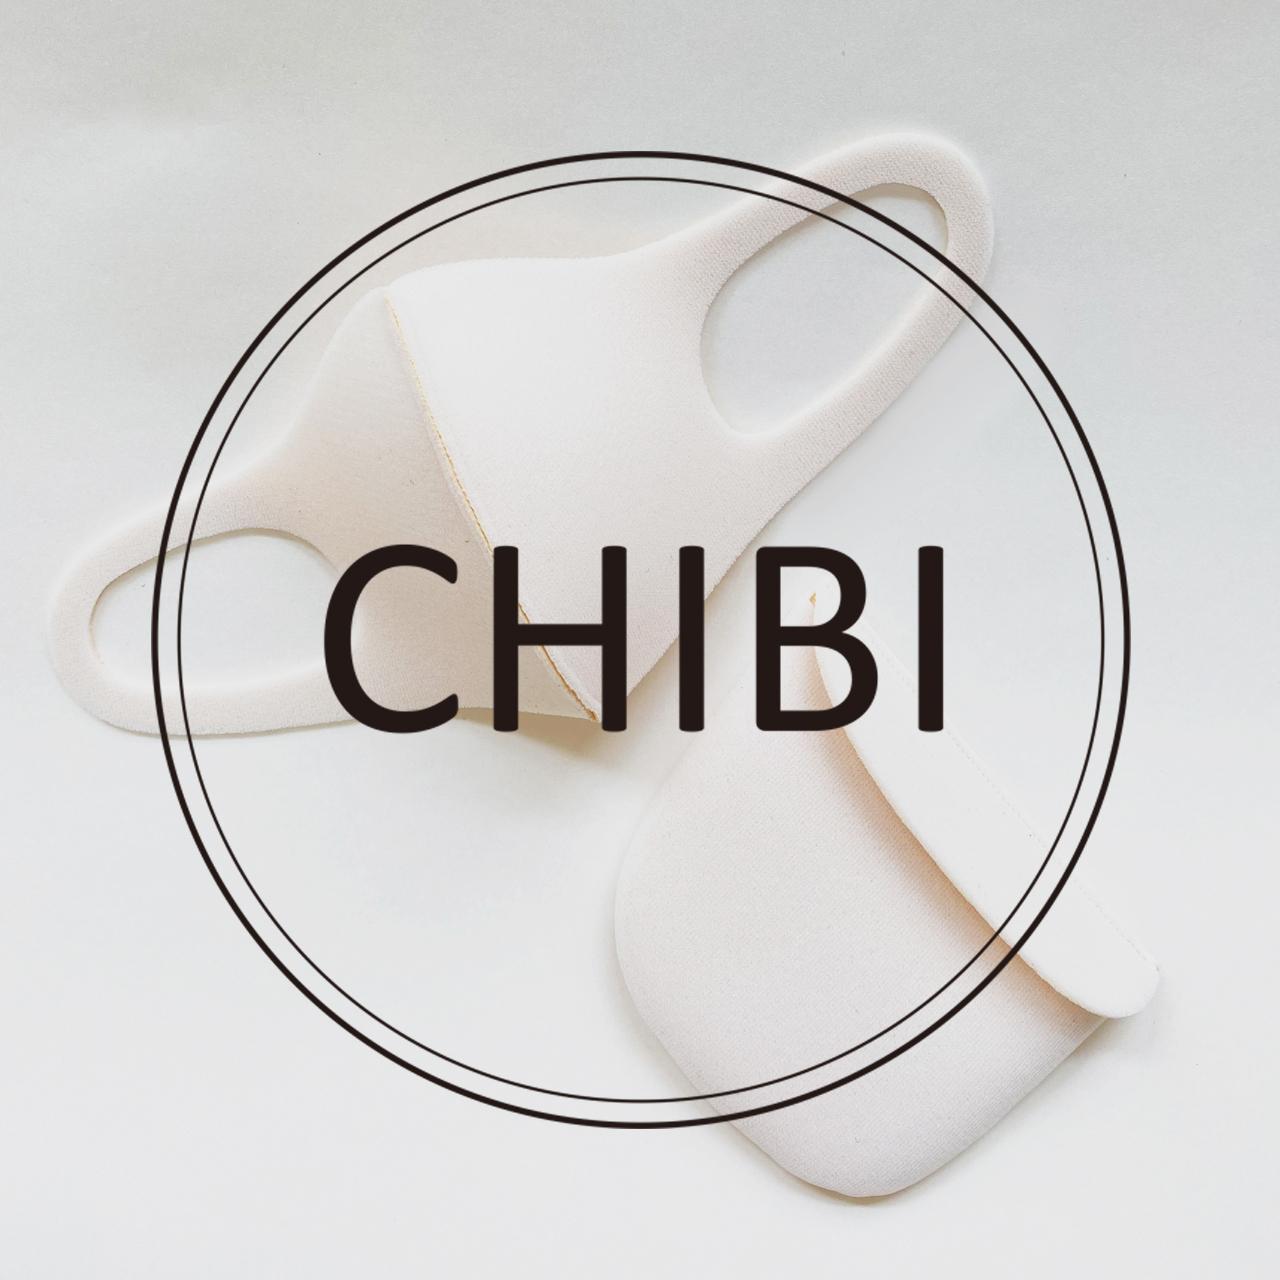 〈OCHIBIマスク〉debut!! | 小柄女性のための新作情報